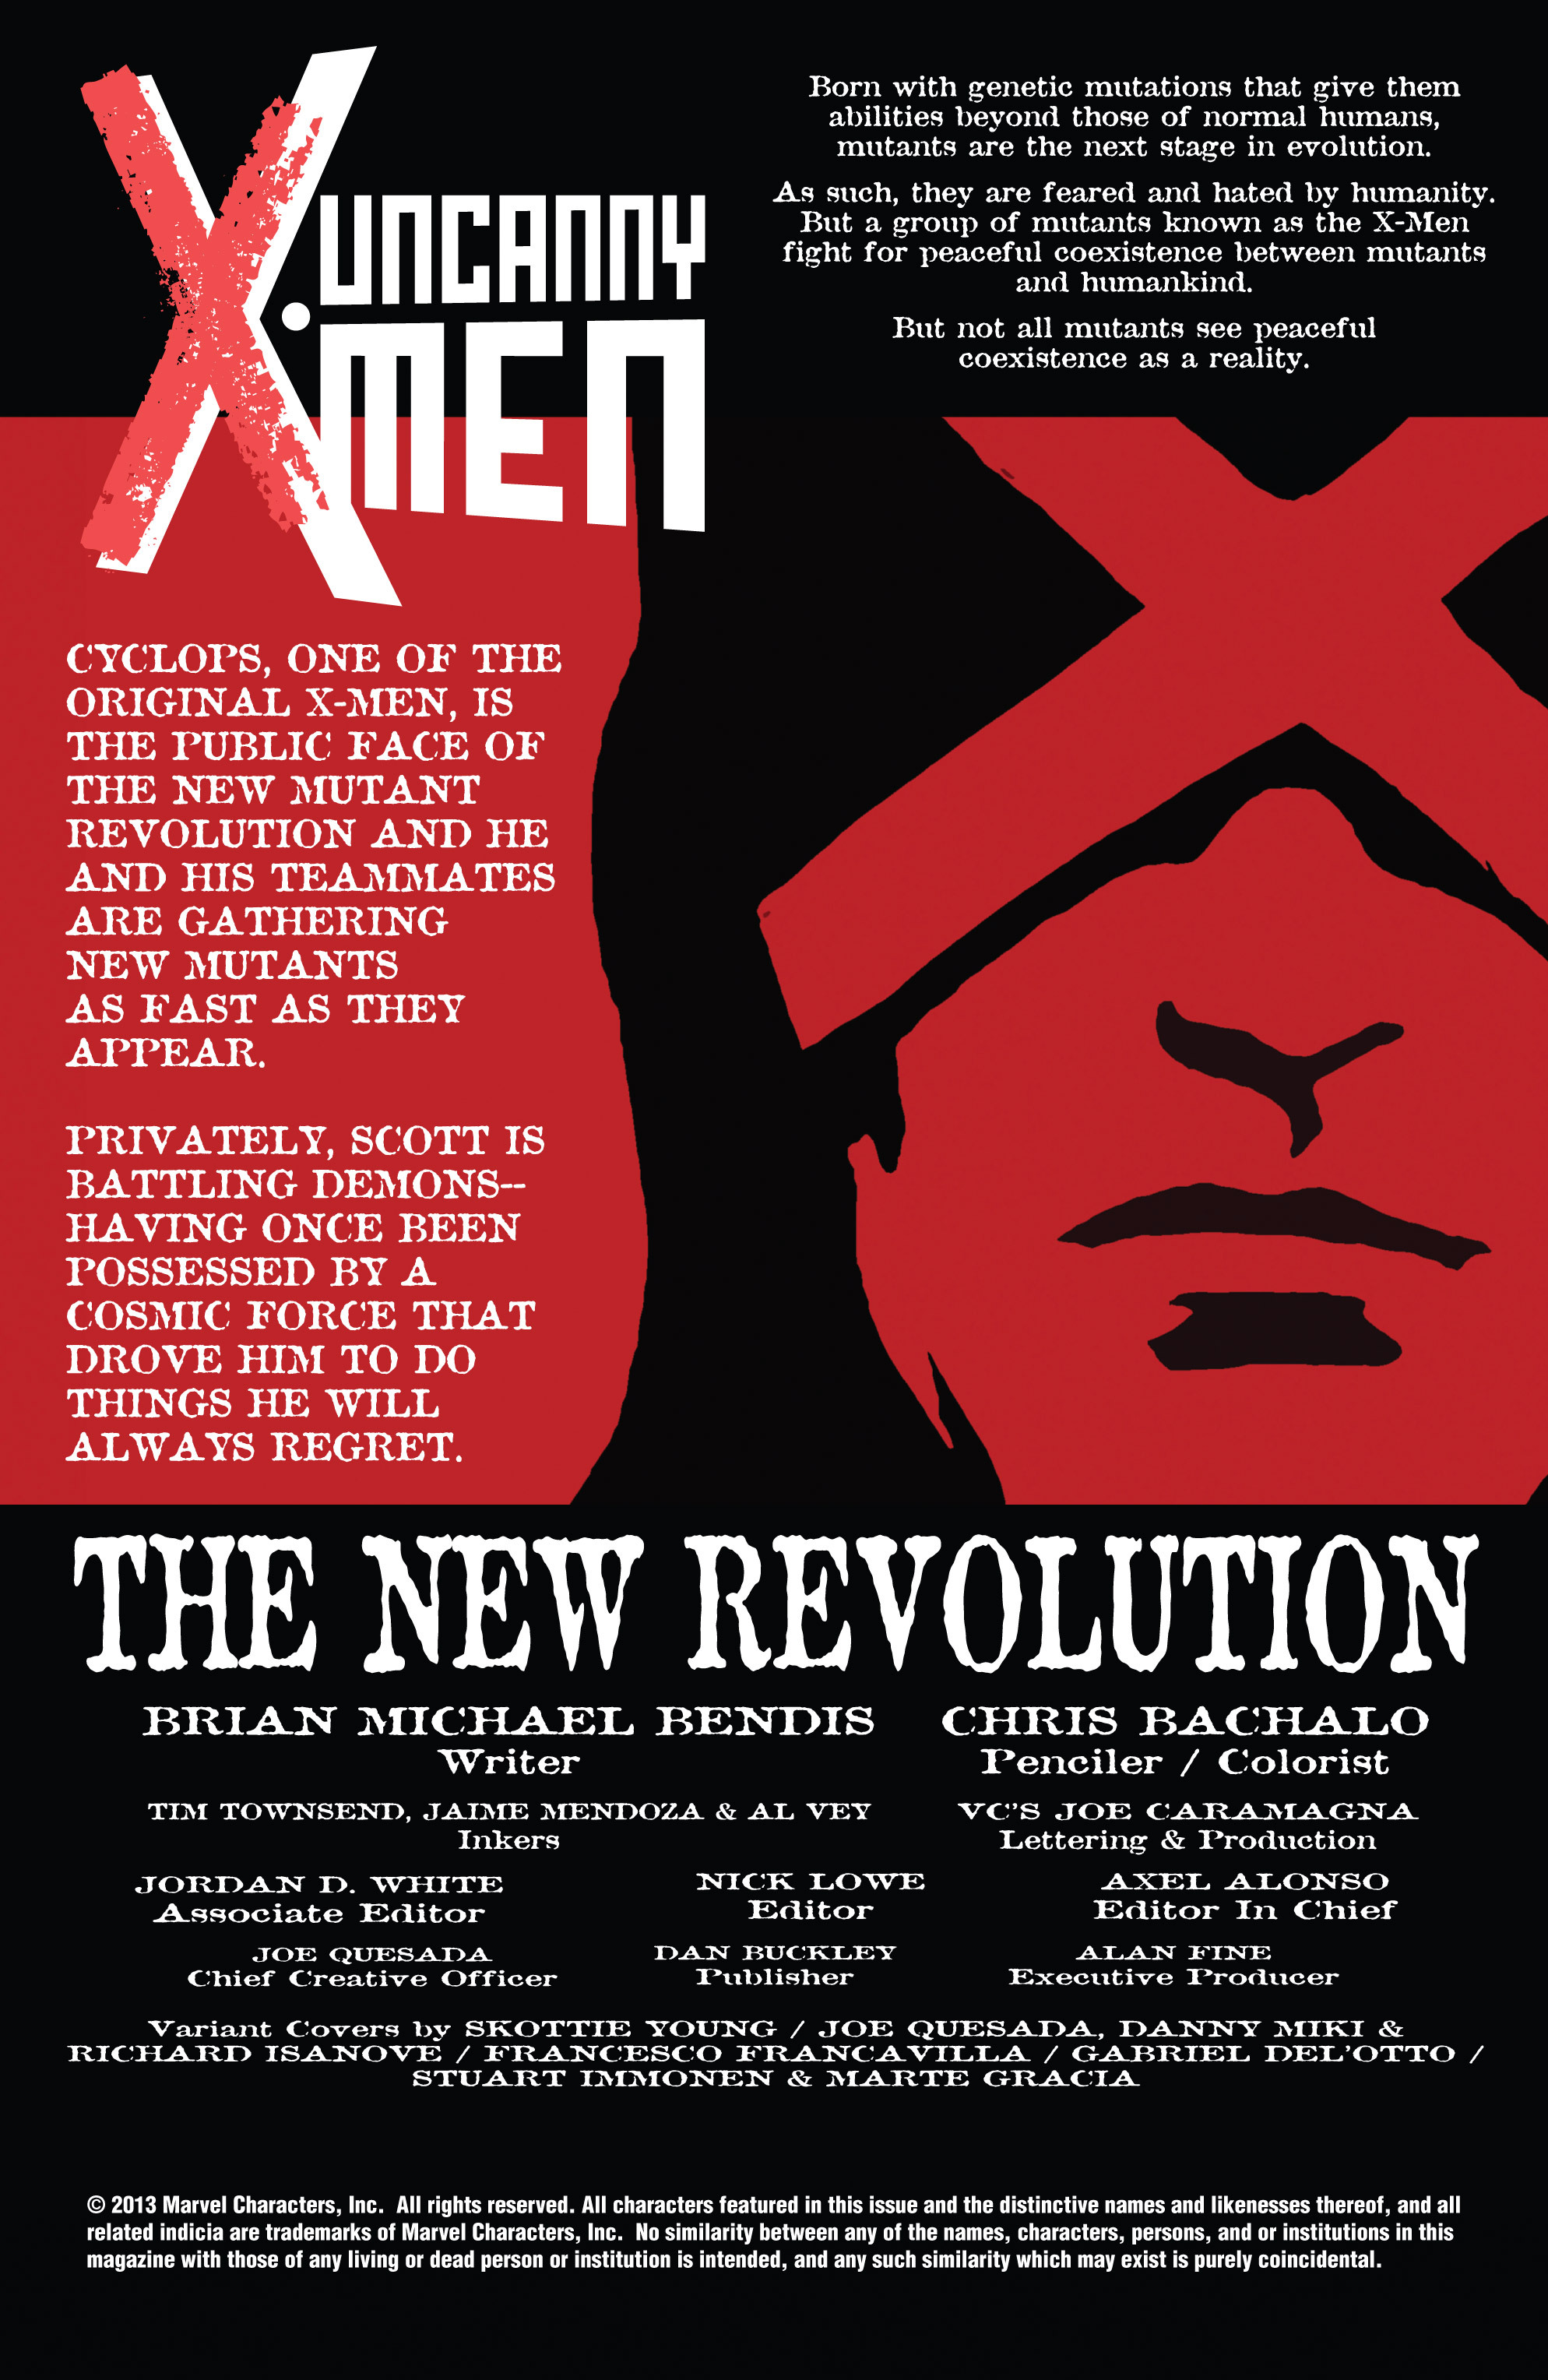 Read online Uncanny X-Men (2013) comic -  Issue # _TPB 1 - Revolution - 4